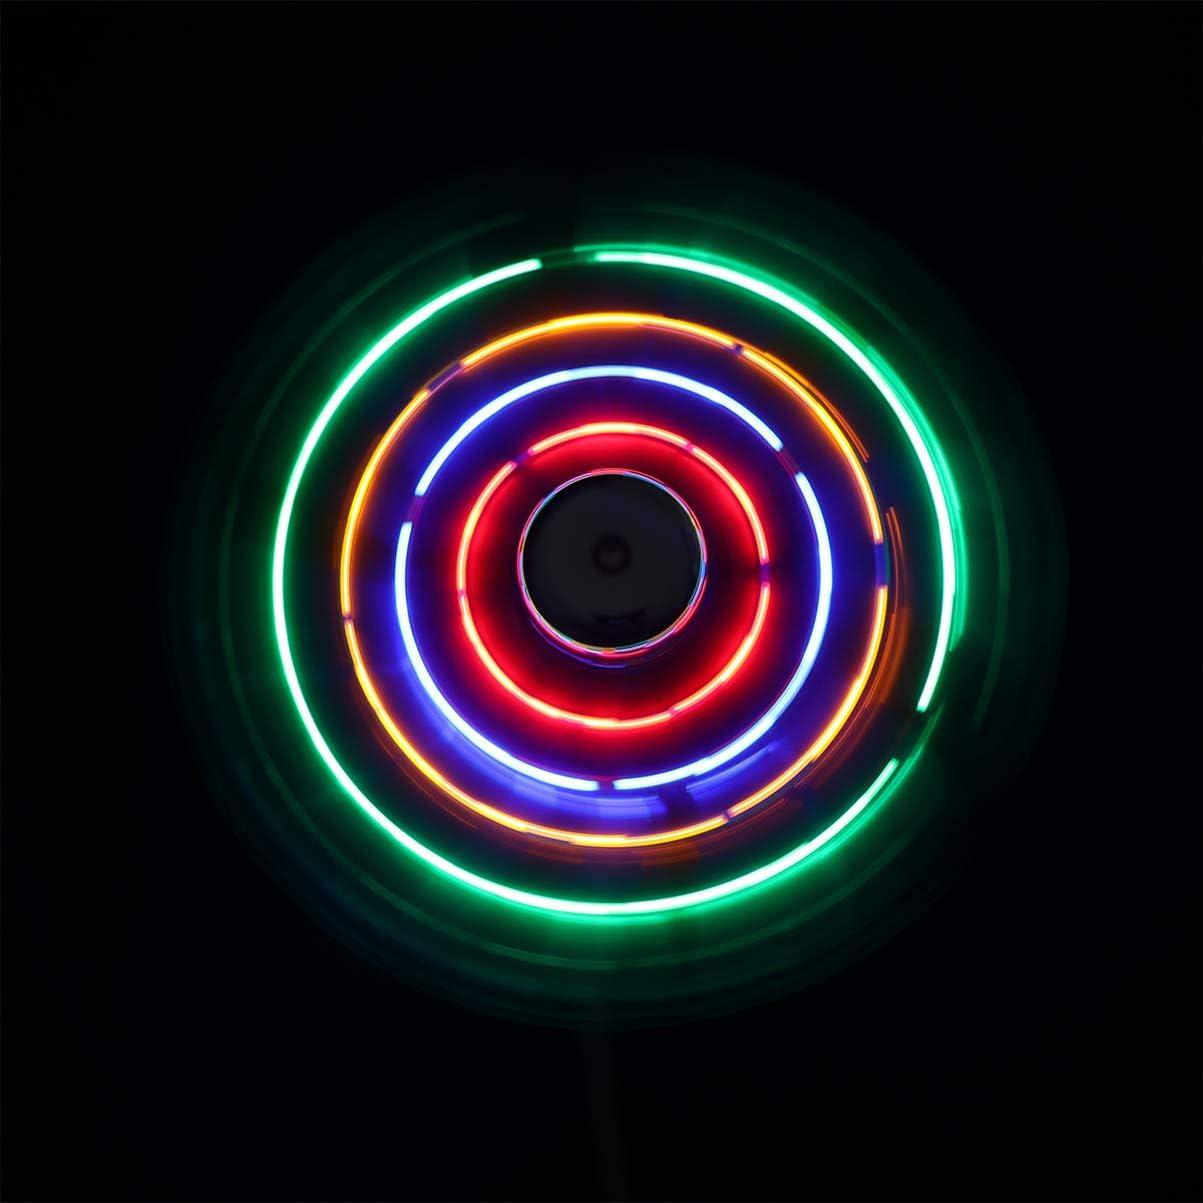 Silver OSALADI Mini USB Fan with 64 Colorful LED Patterns Circular Display Summer Necessary